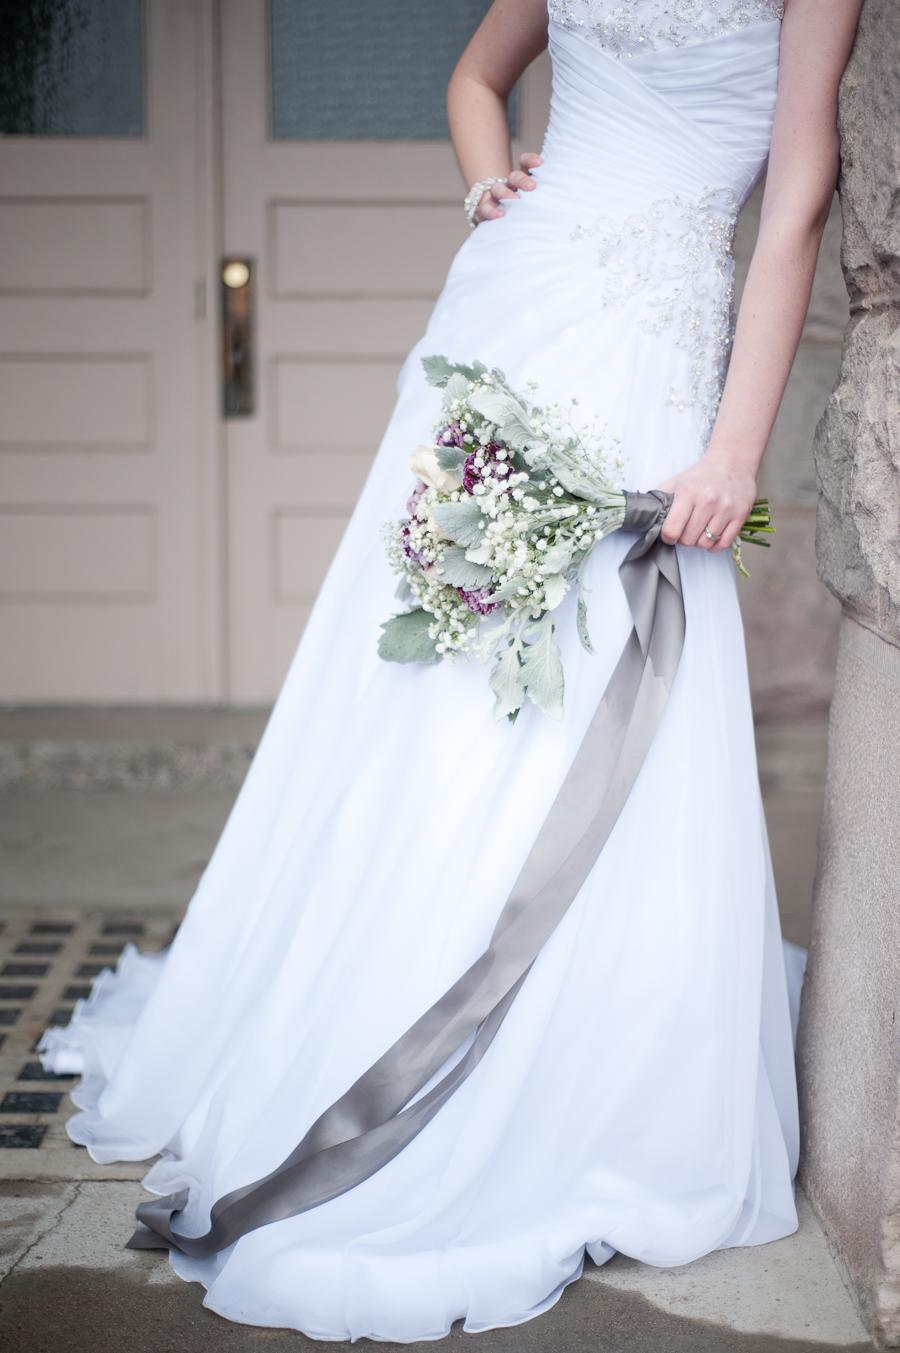 Susannah_Deangelo_Antique_Silver_Music_Hall_Wedding-10.jpg